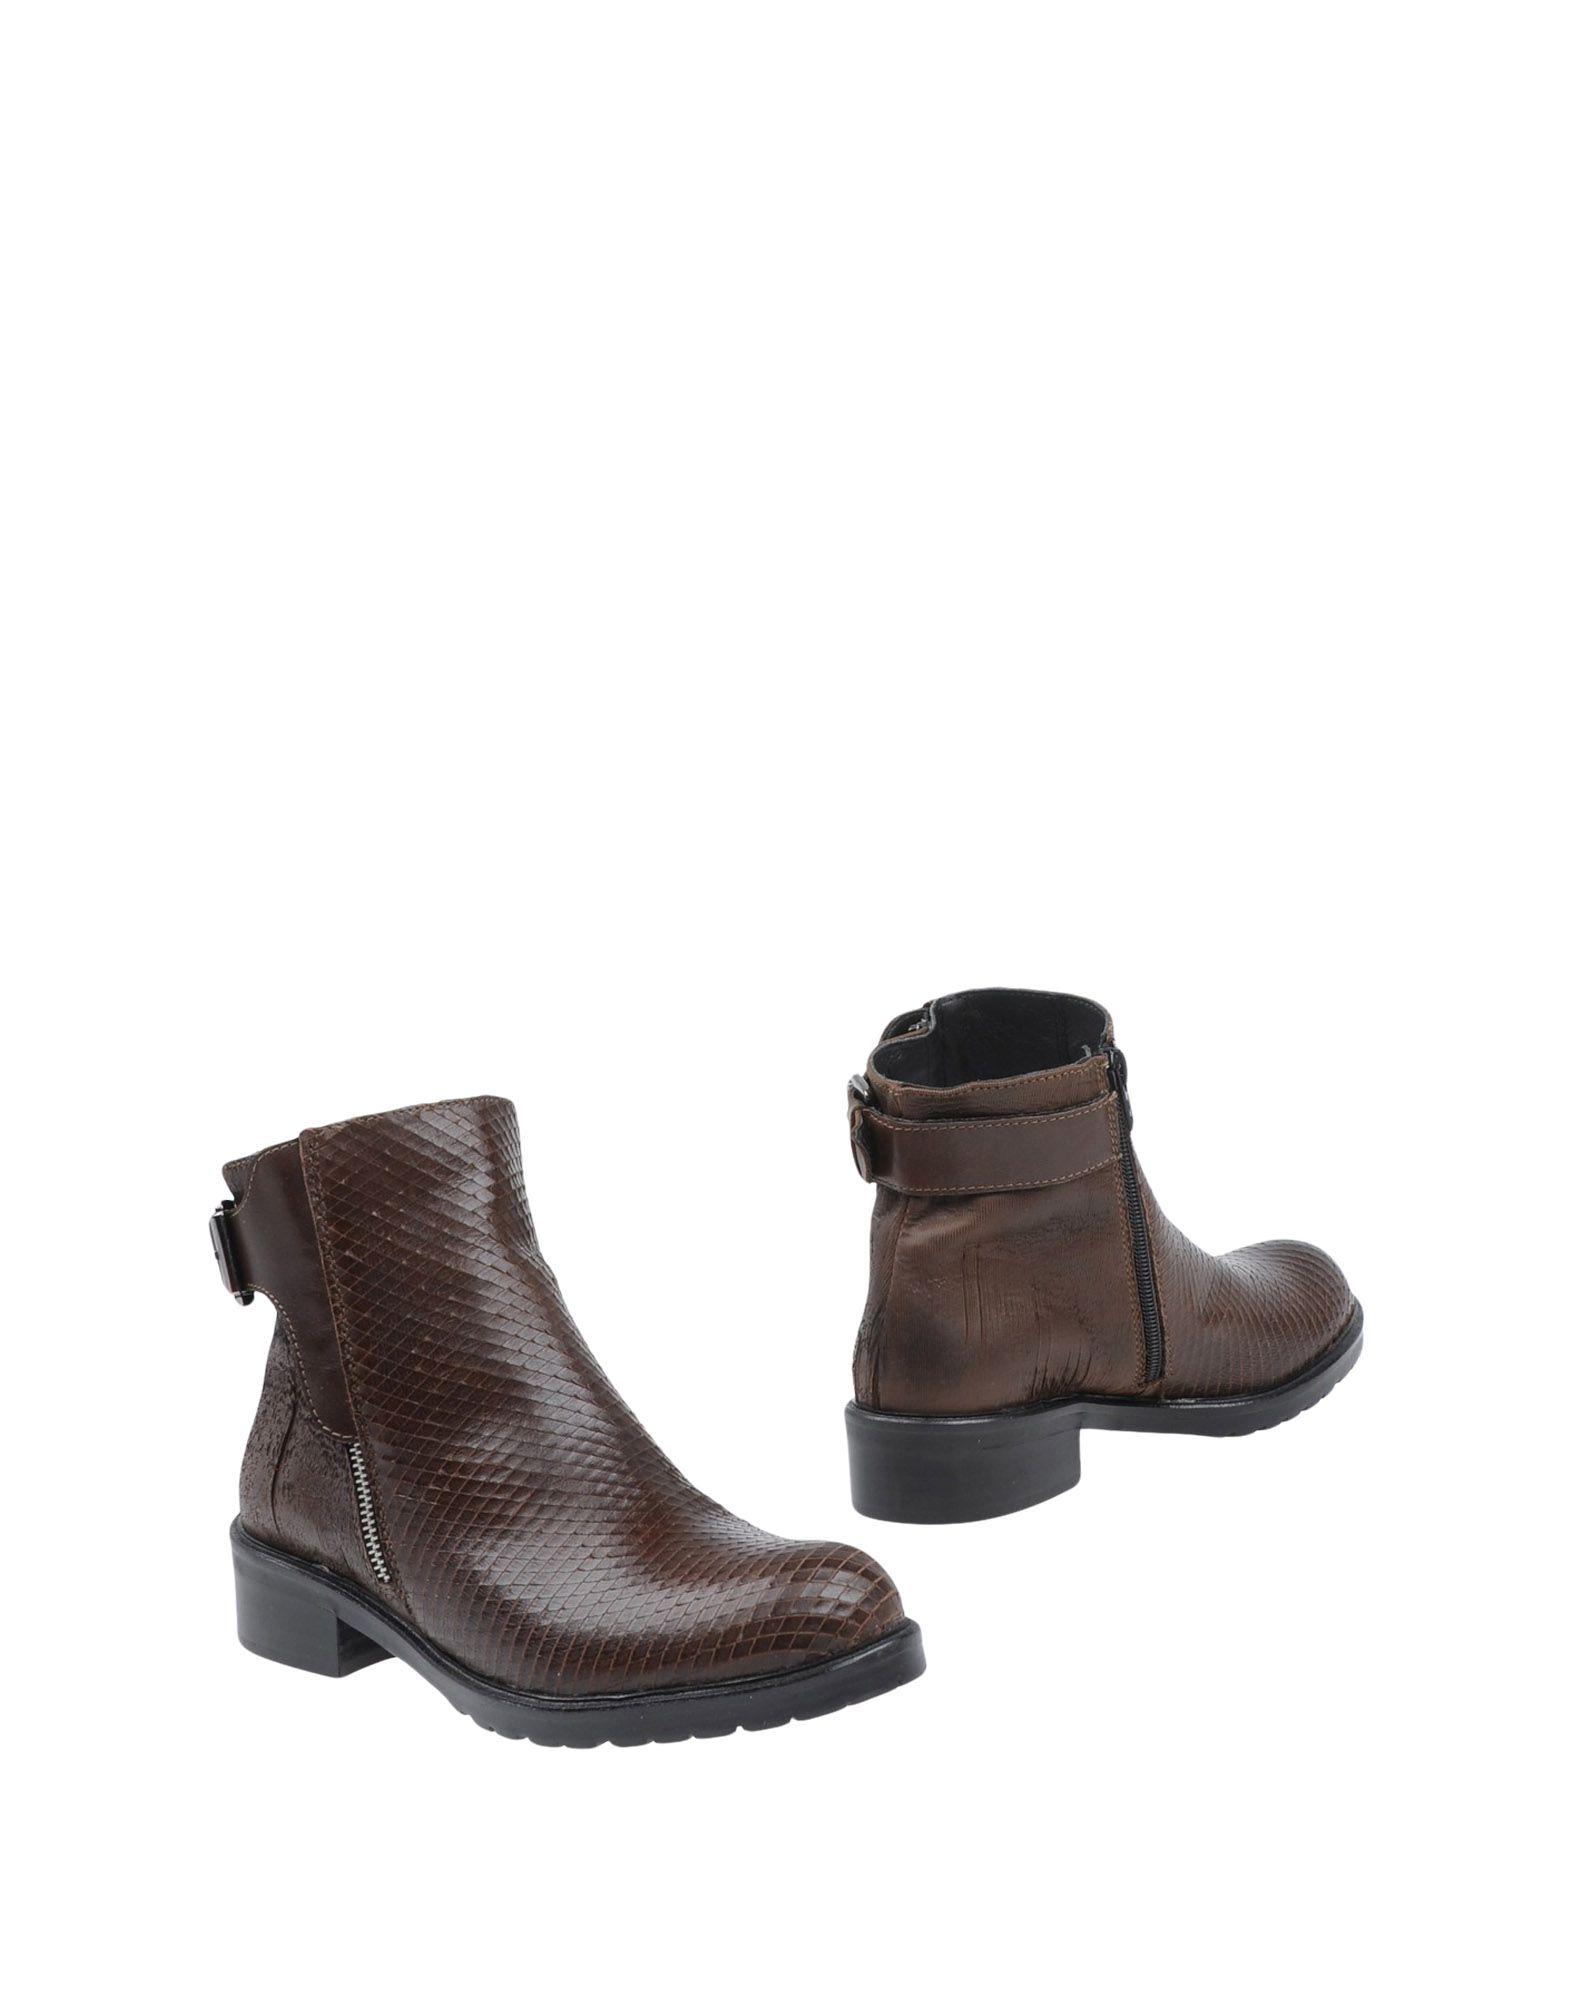 NEURONE Полусапоги и высокие ботинки цены онлайн